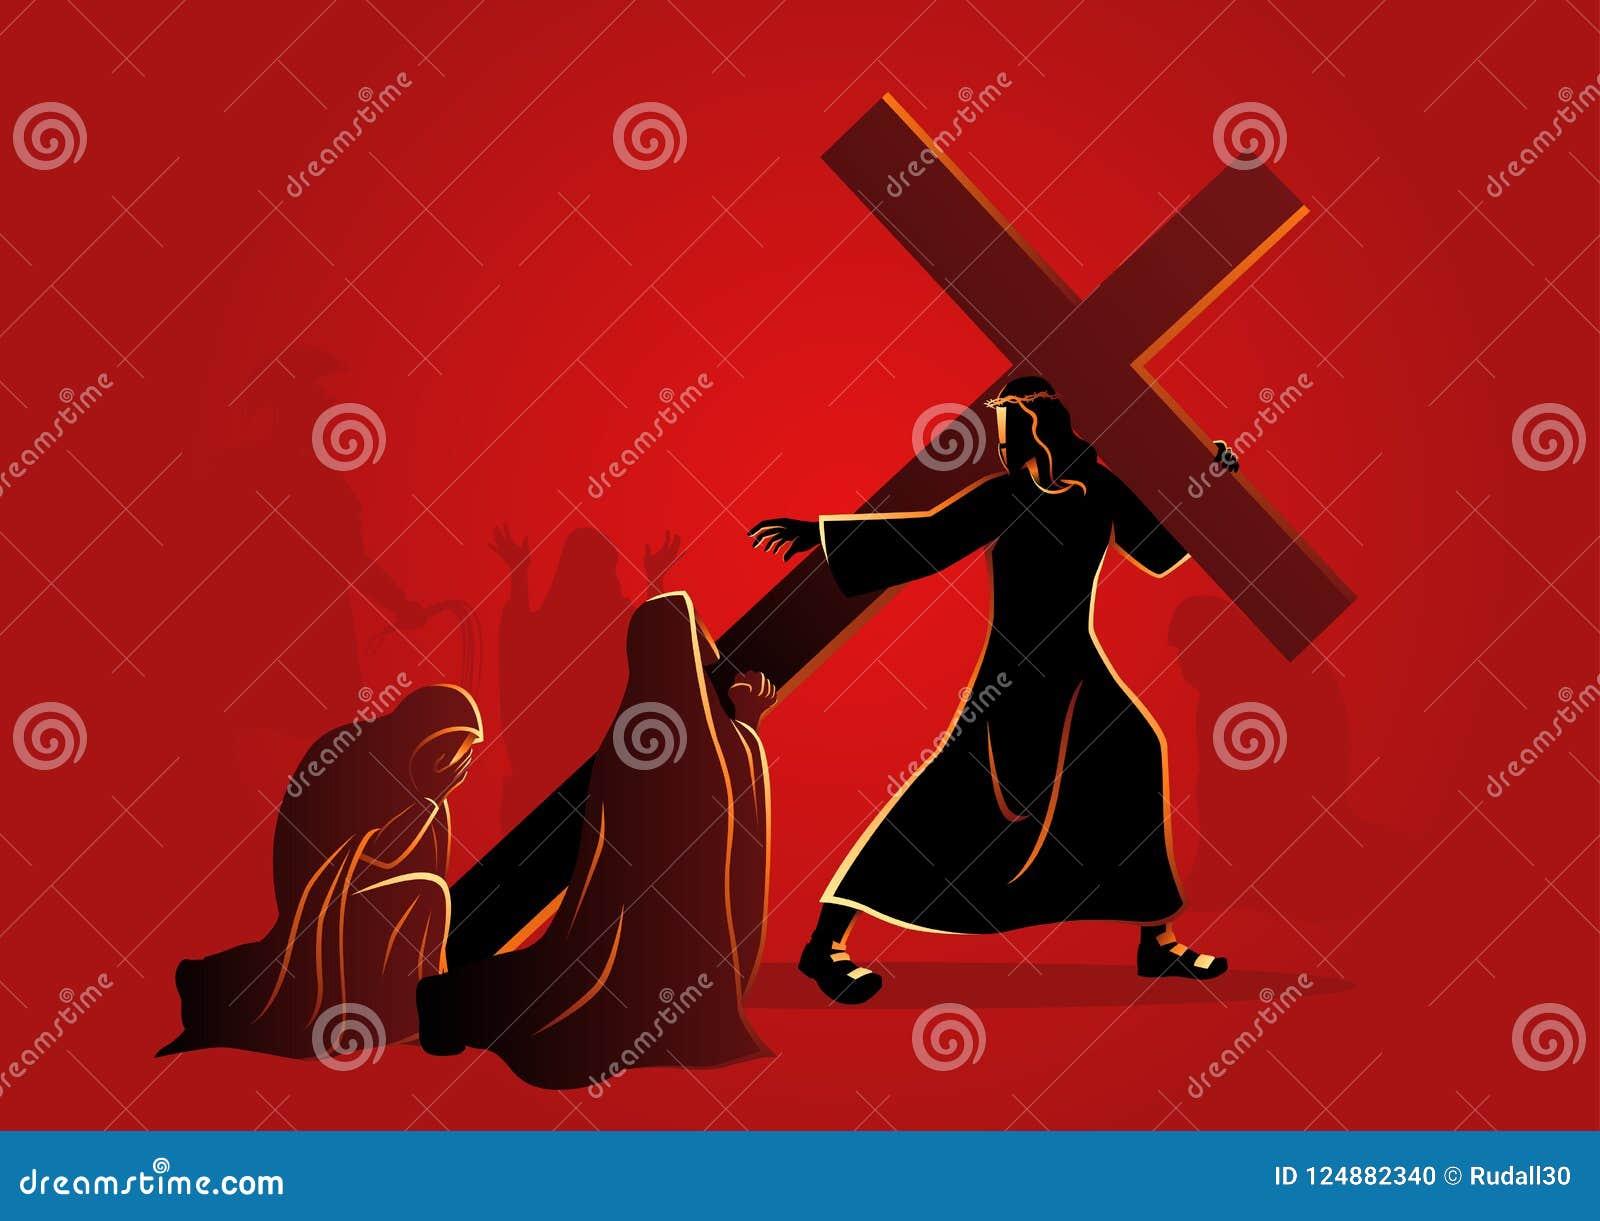 As mulheres do Jerusalém lamentam para Jesus